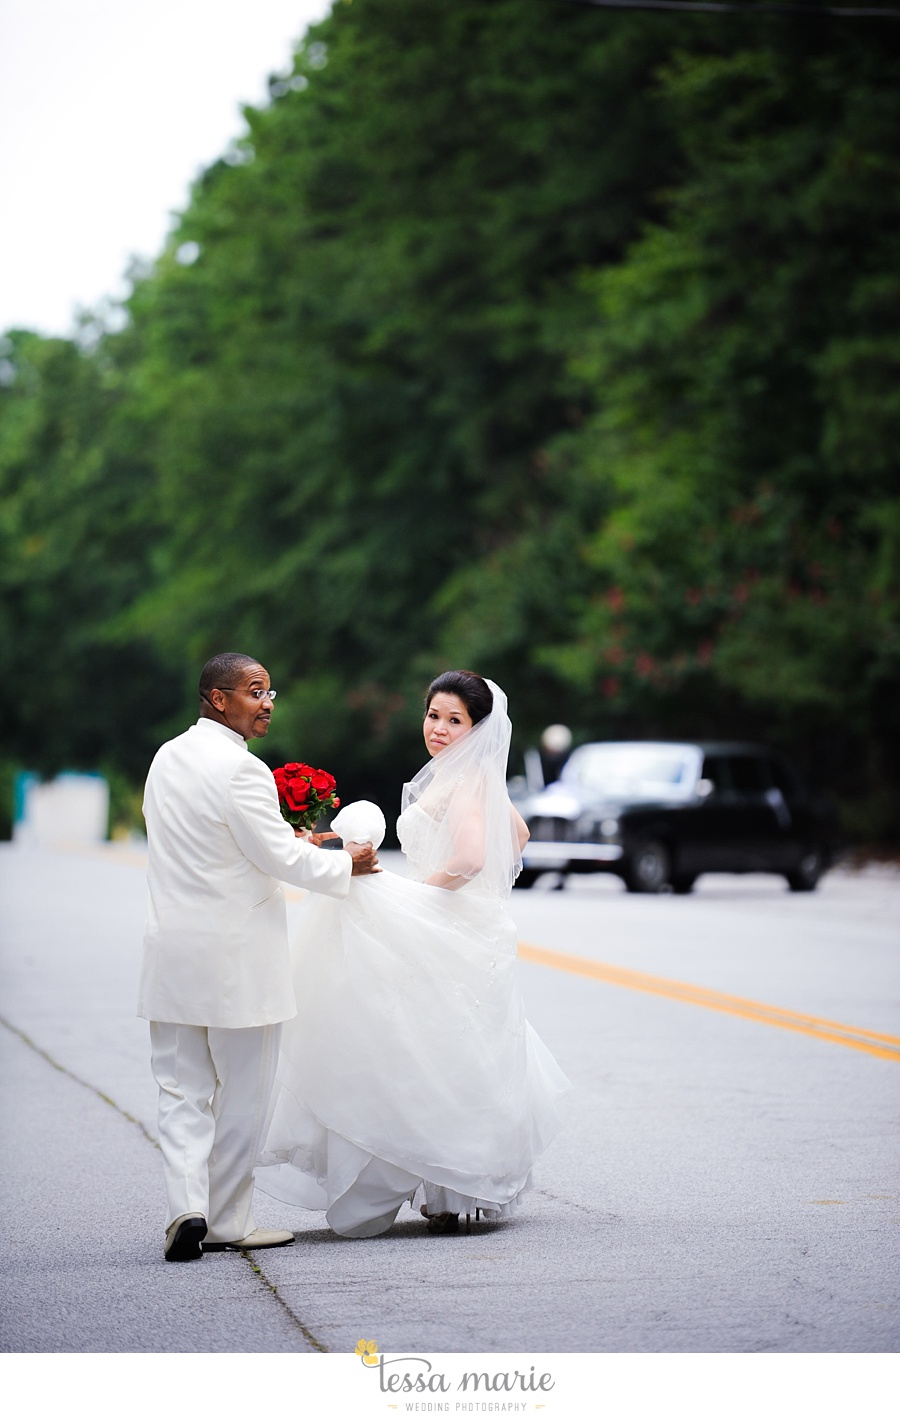 evergreen_resort_wedding_reception_stone_mountain_tessa_marie_weddings_0048